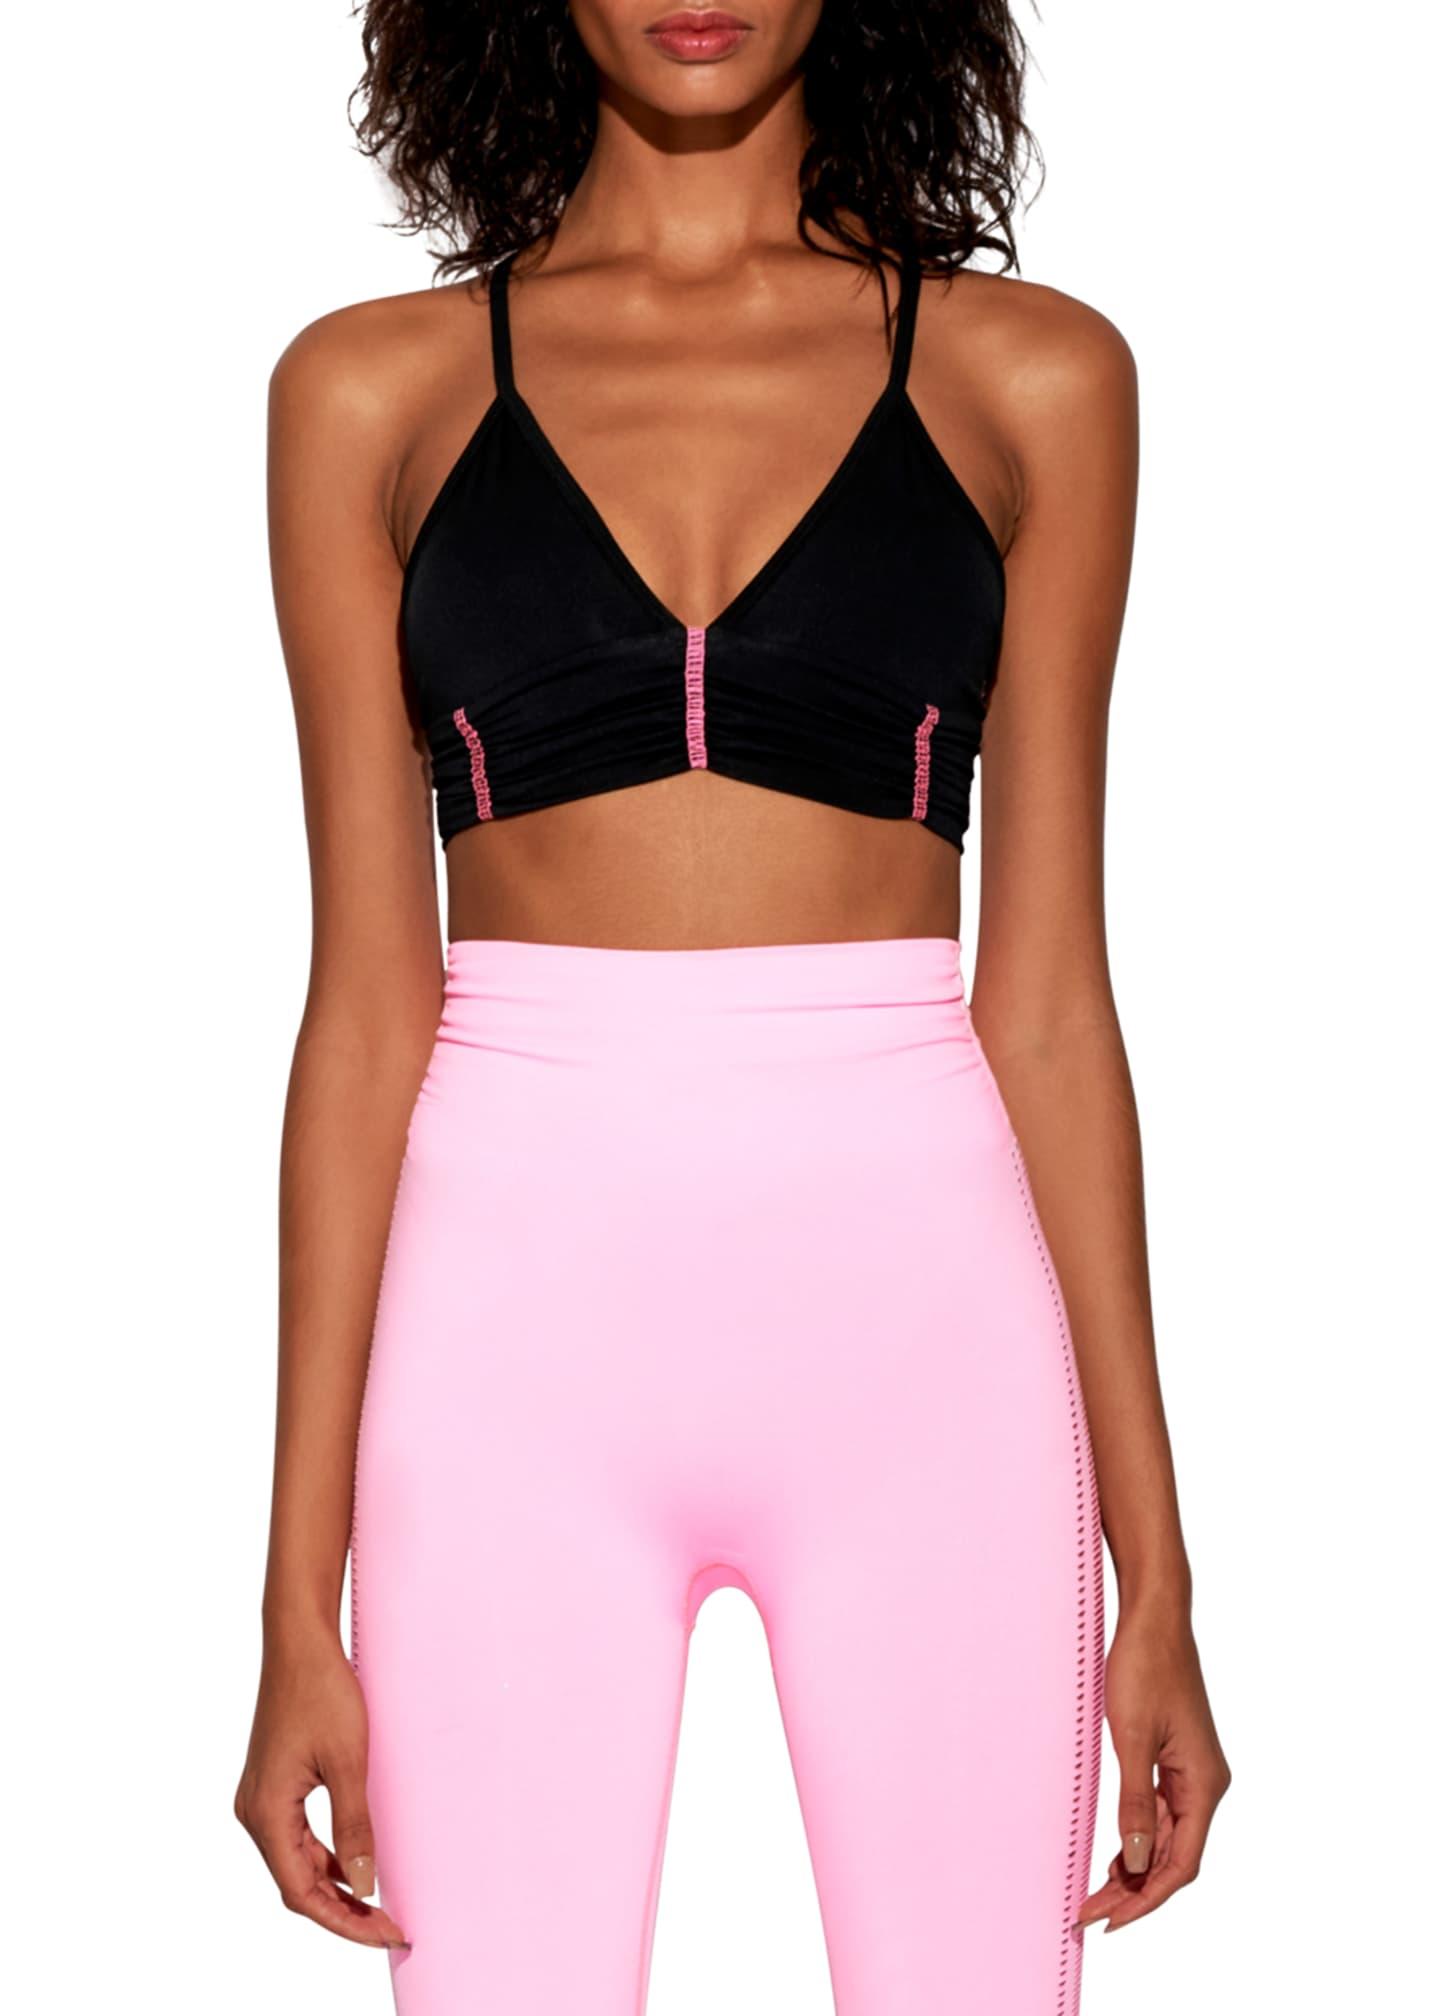 Body Language Sportswear Scrunchy Cross-Back Sports Bra